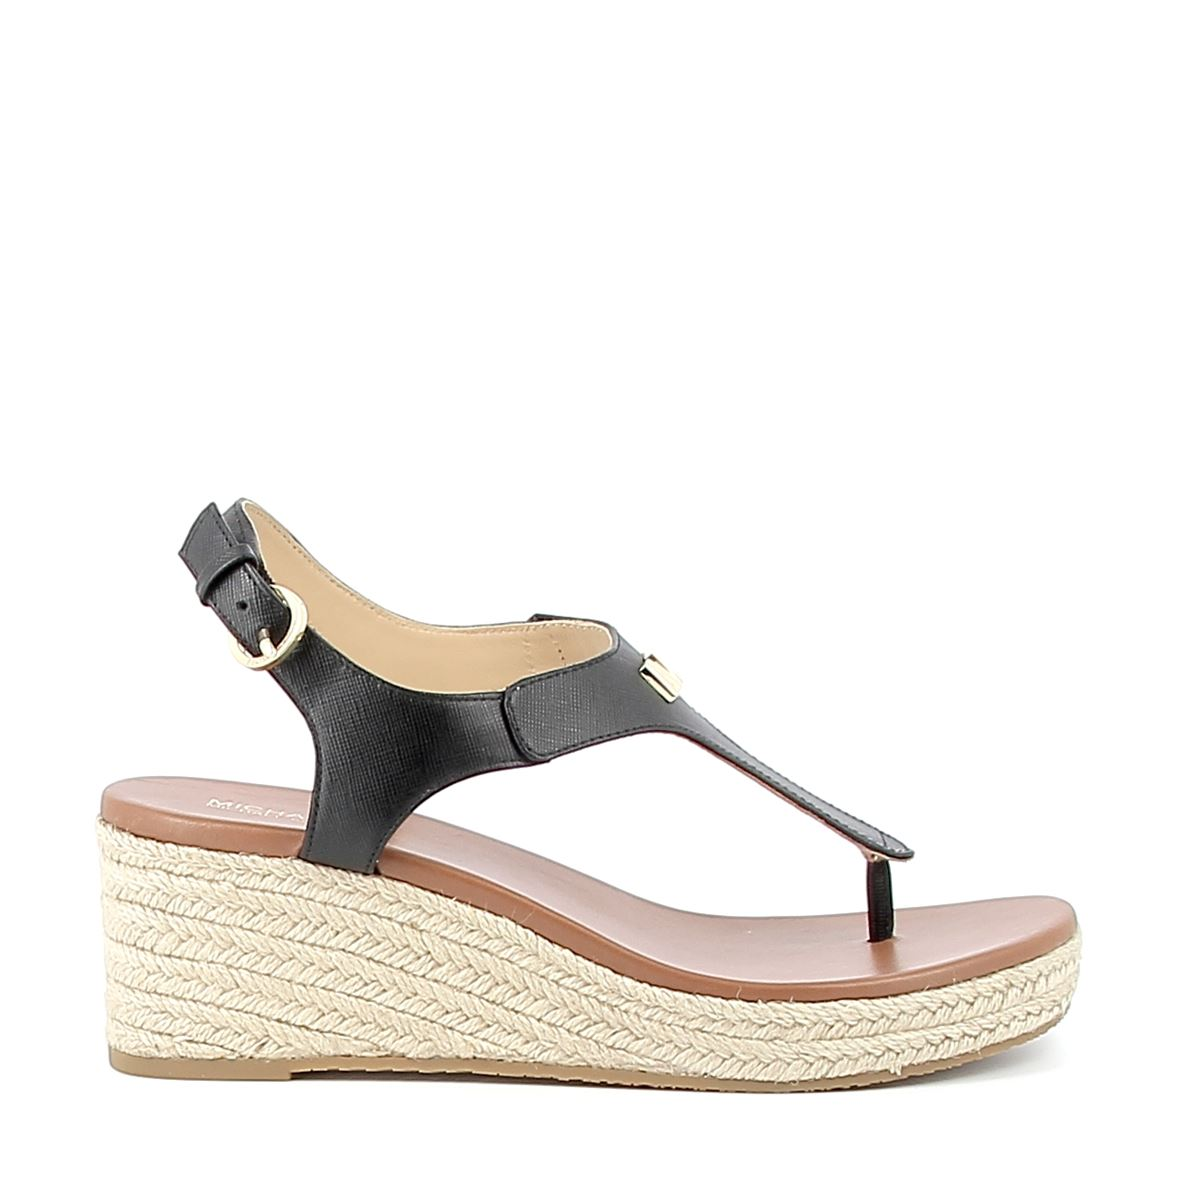 Sandale femme MICHAEL KORS Laney thong